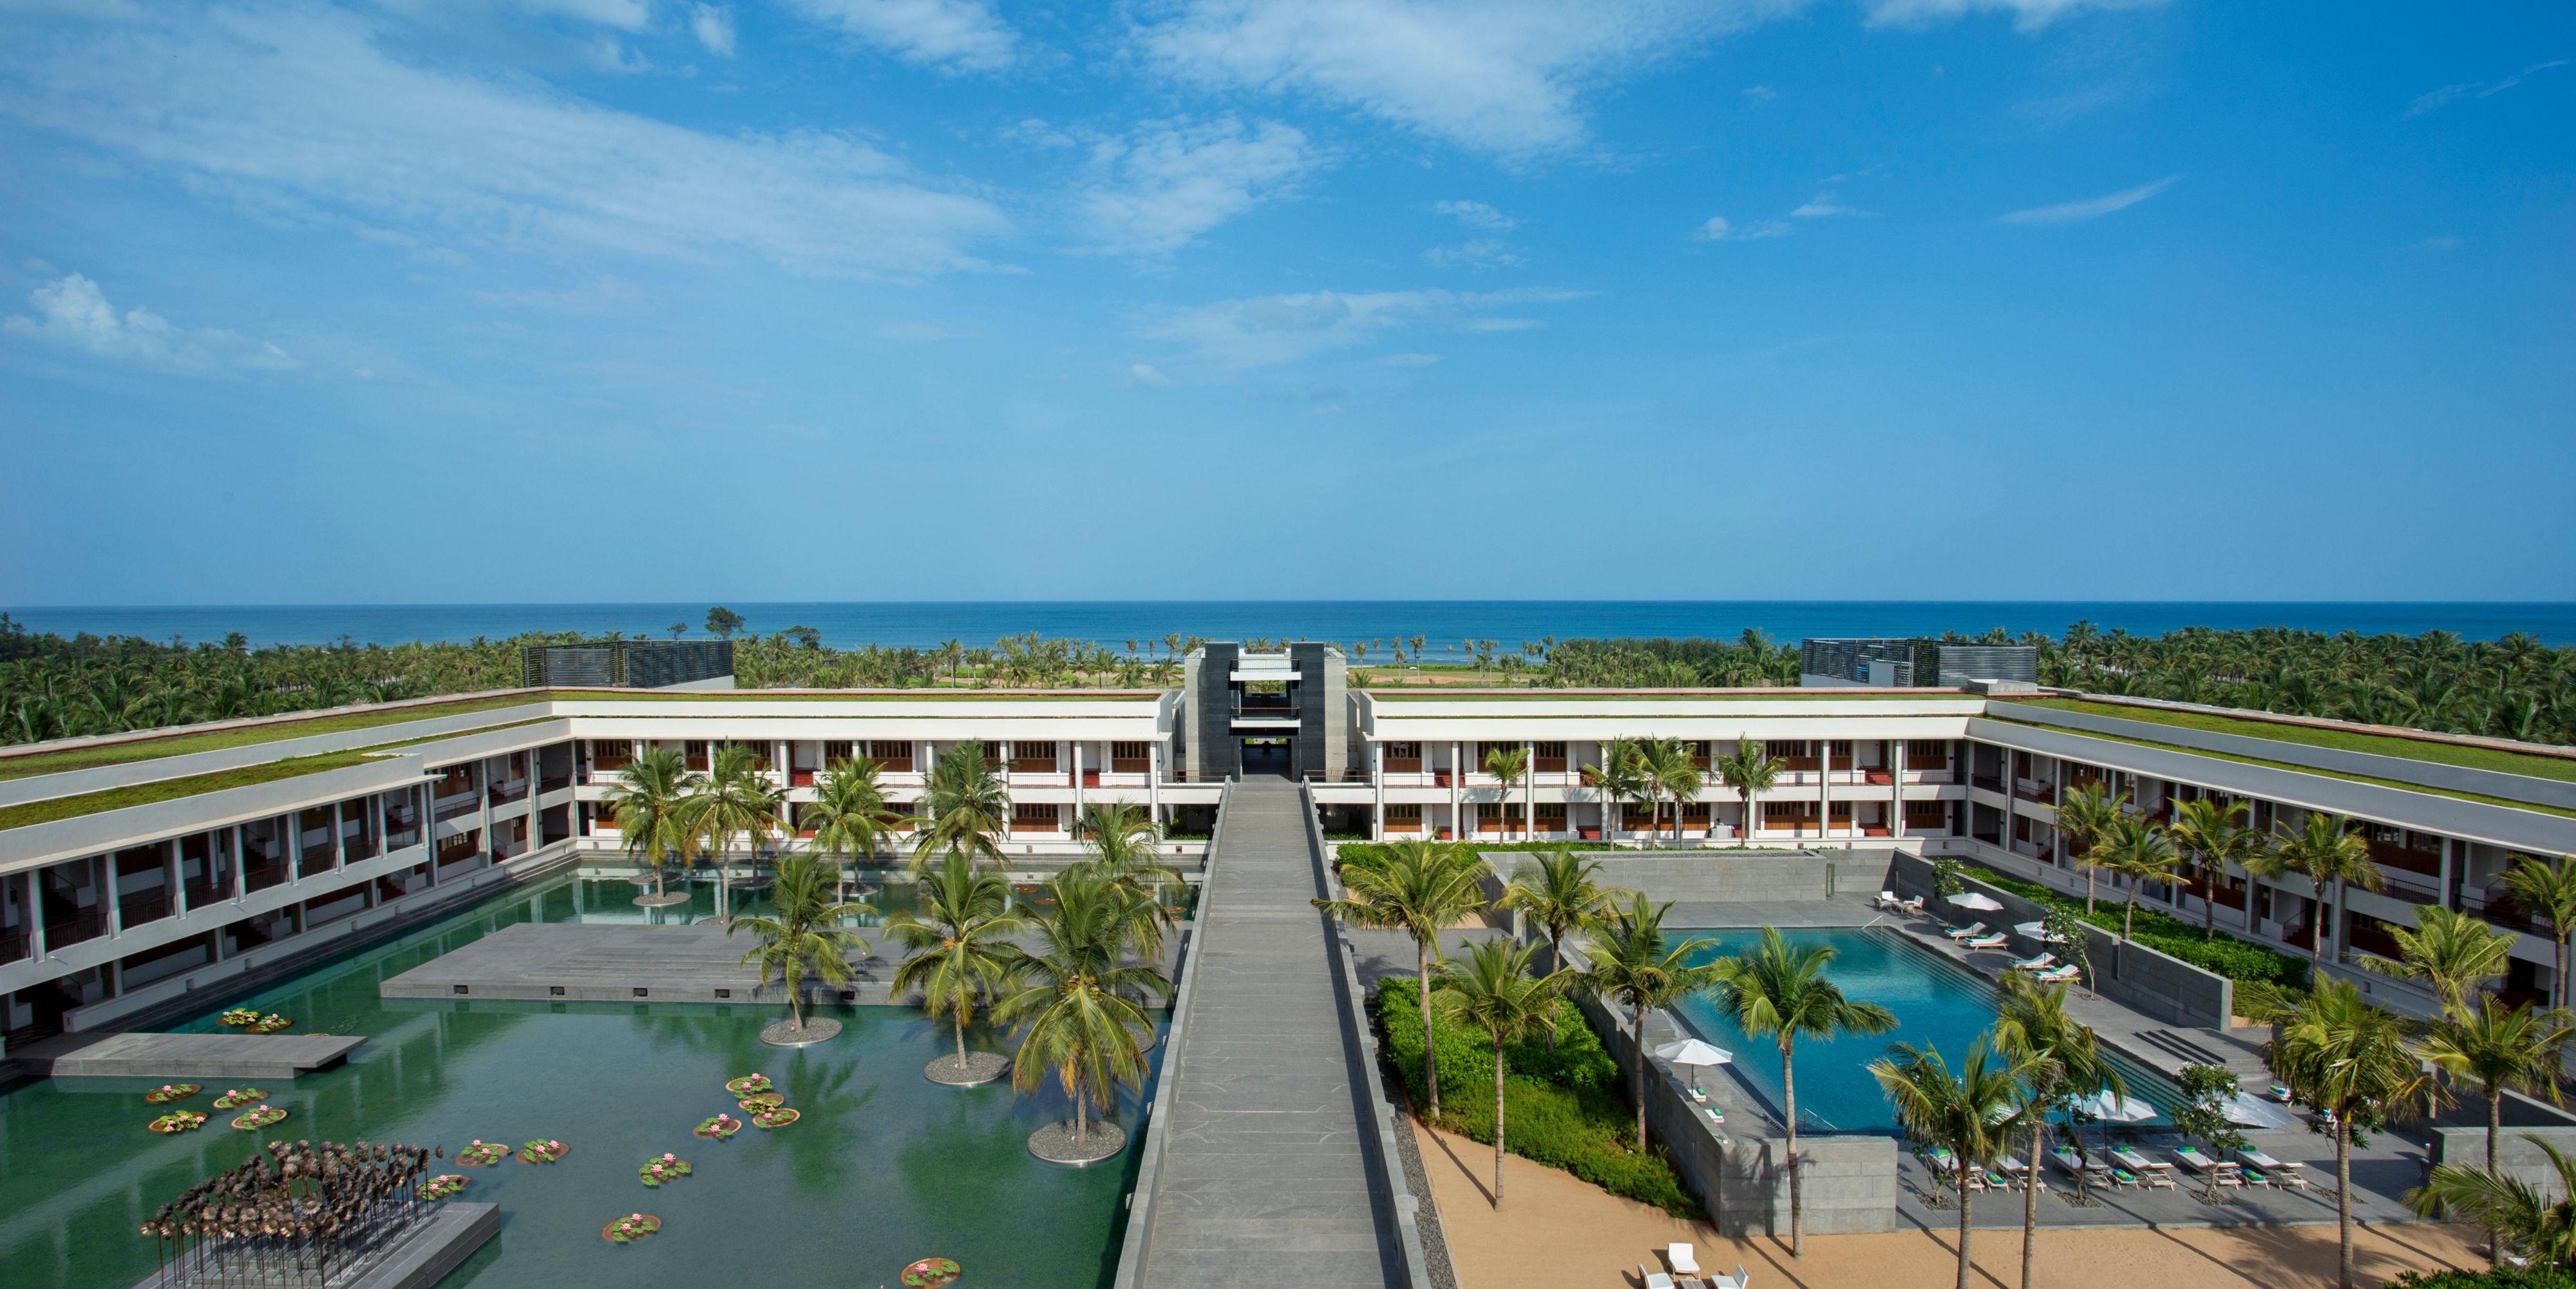 Hotel Reviews For Intercontinental Chennai Mahabalipuram Resort